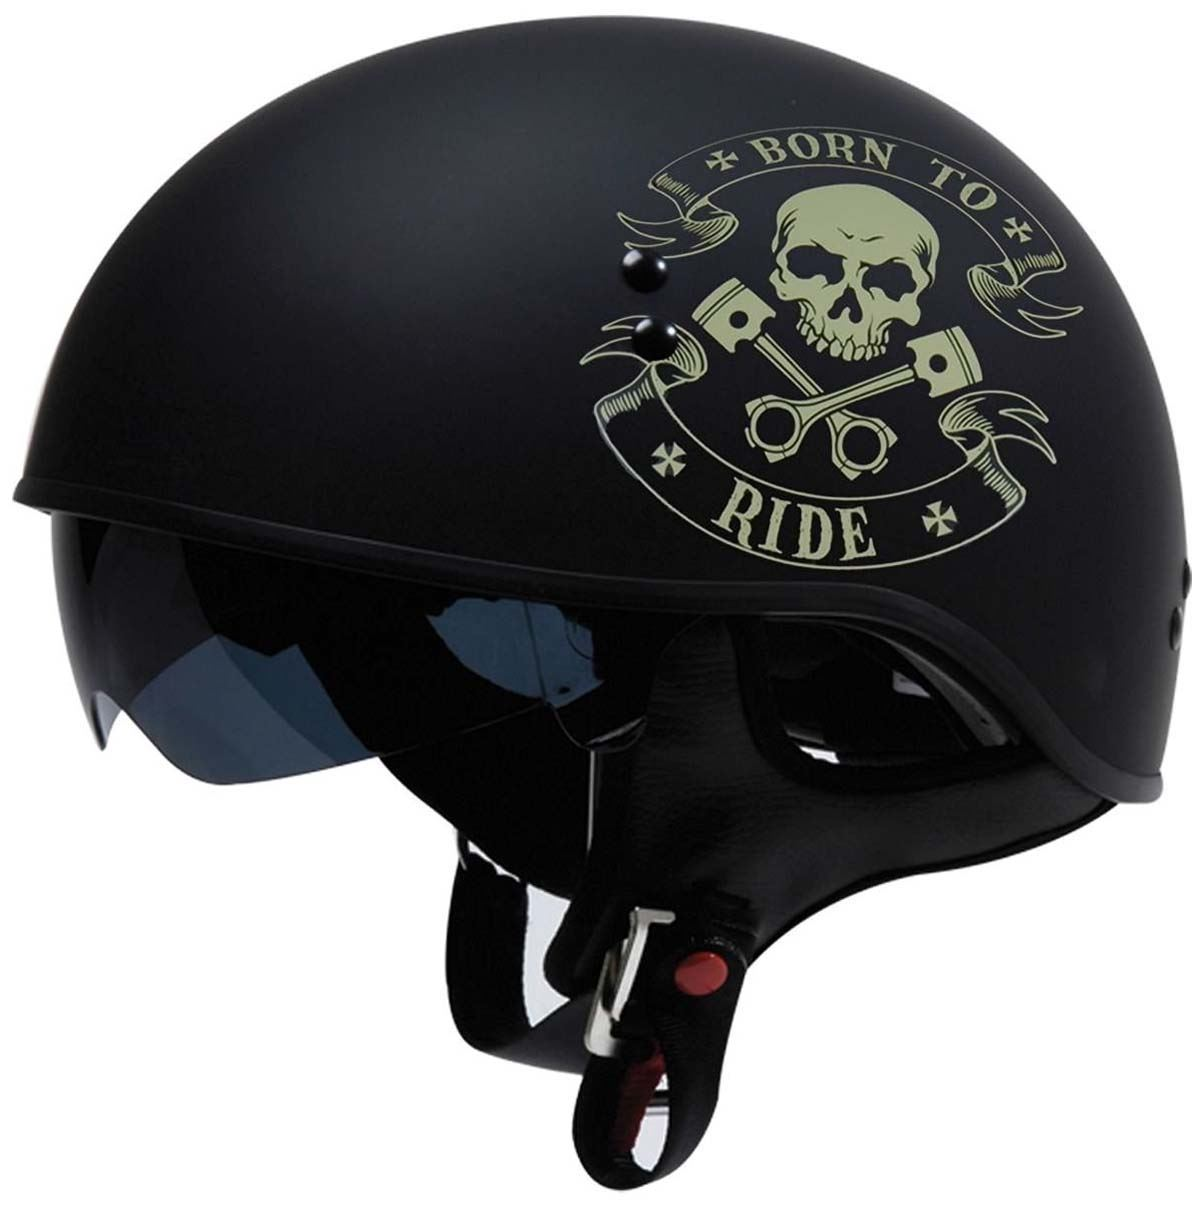 Skid Lid Helmets Original Helmet SIZE 2XL Flat Black